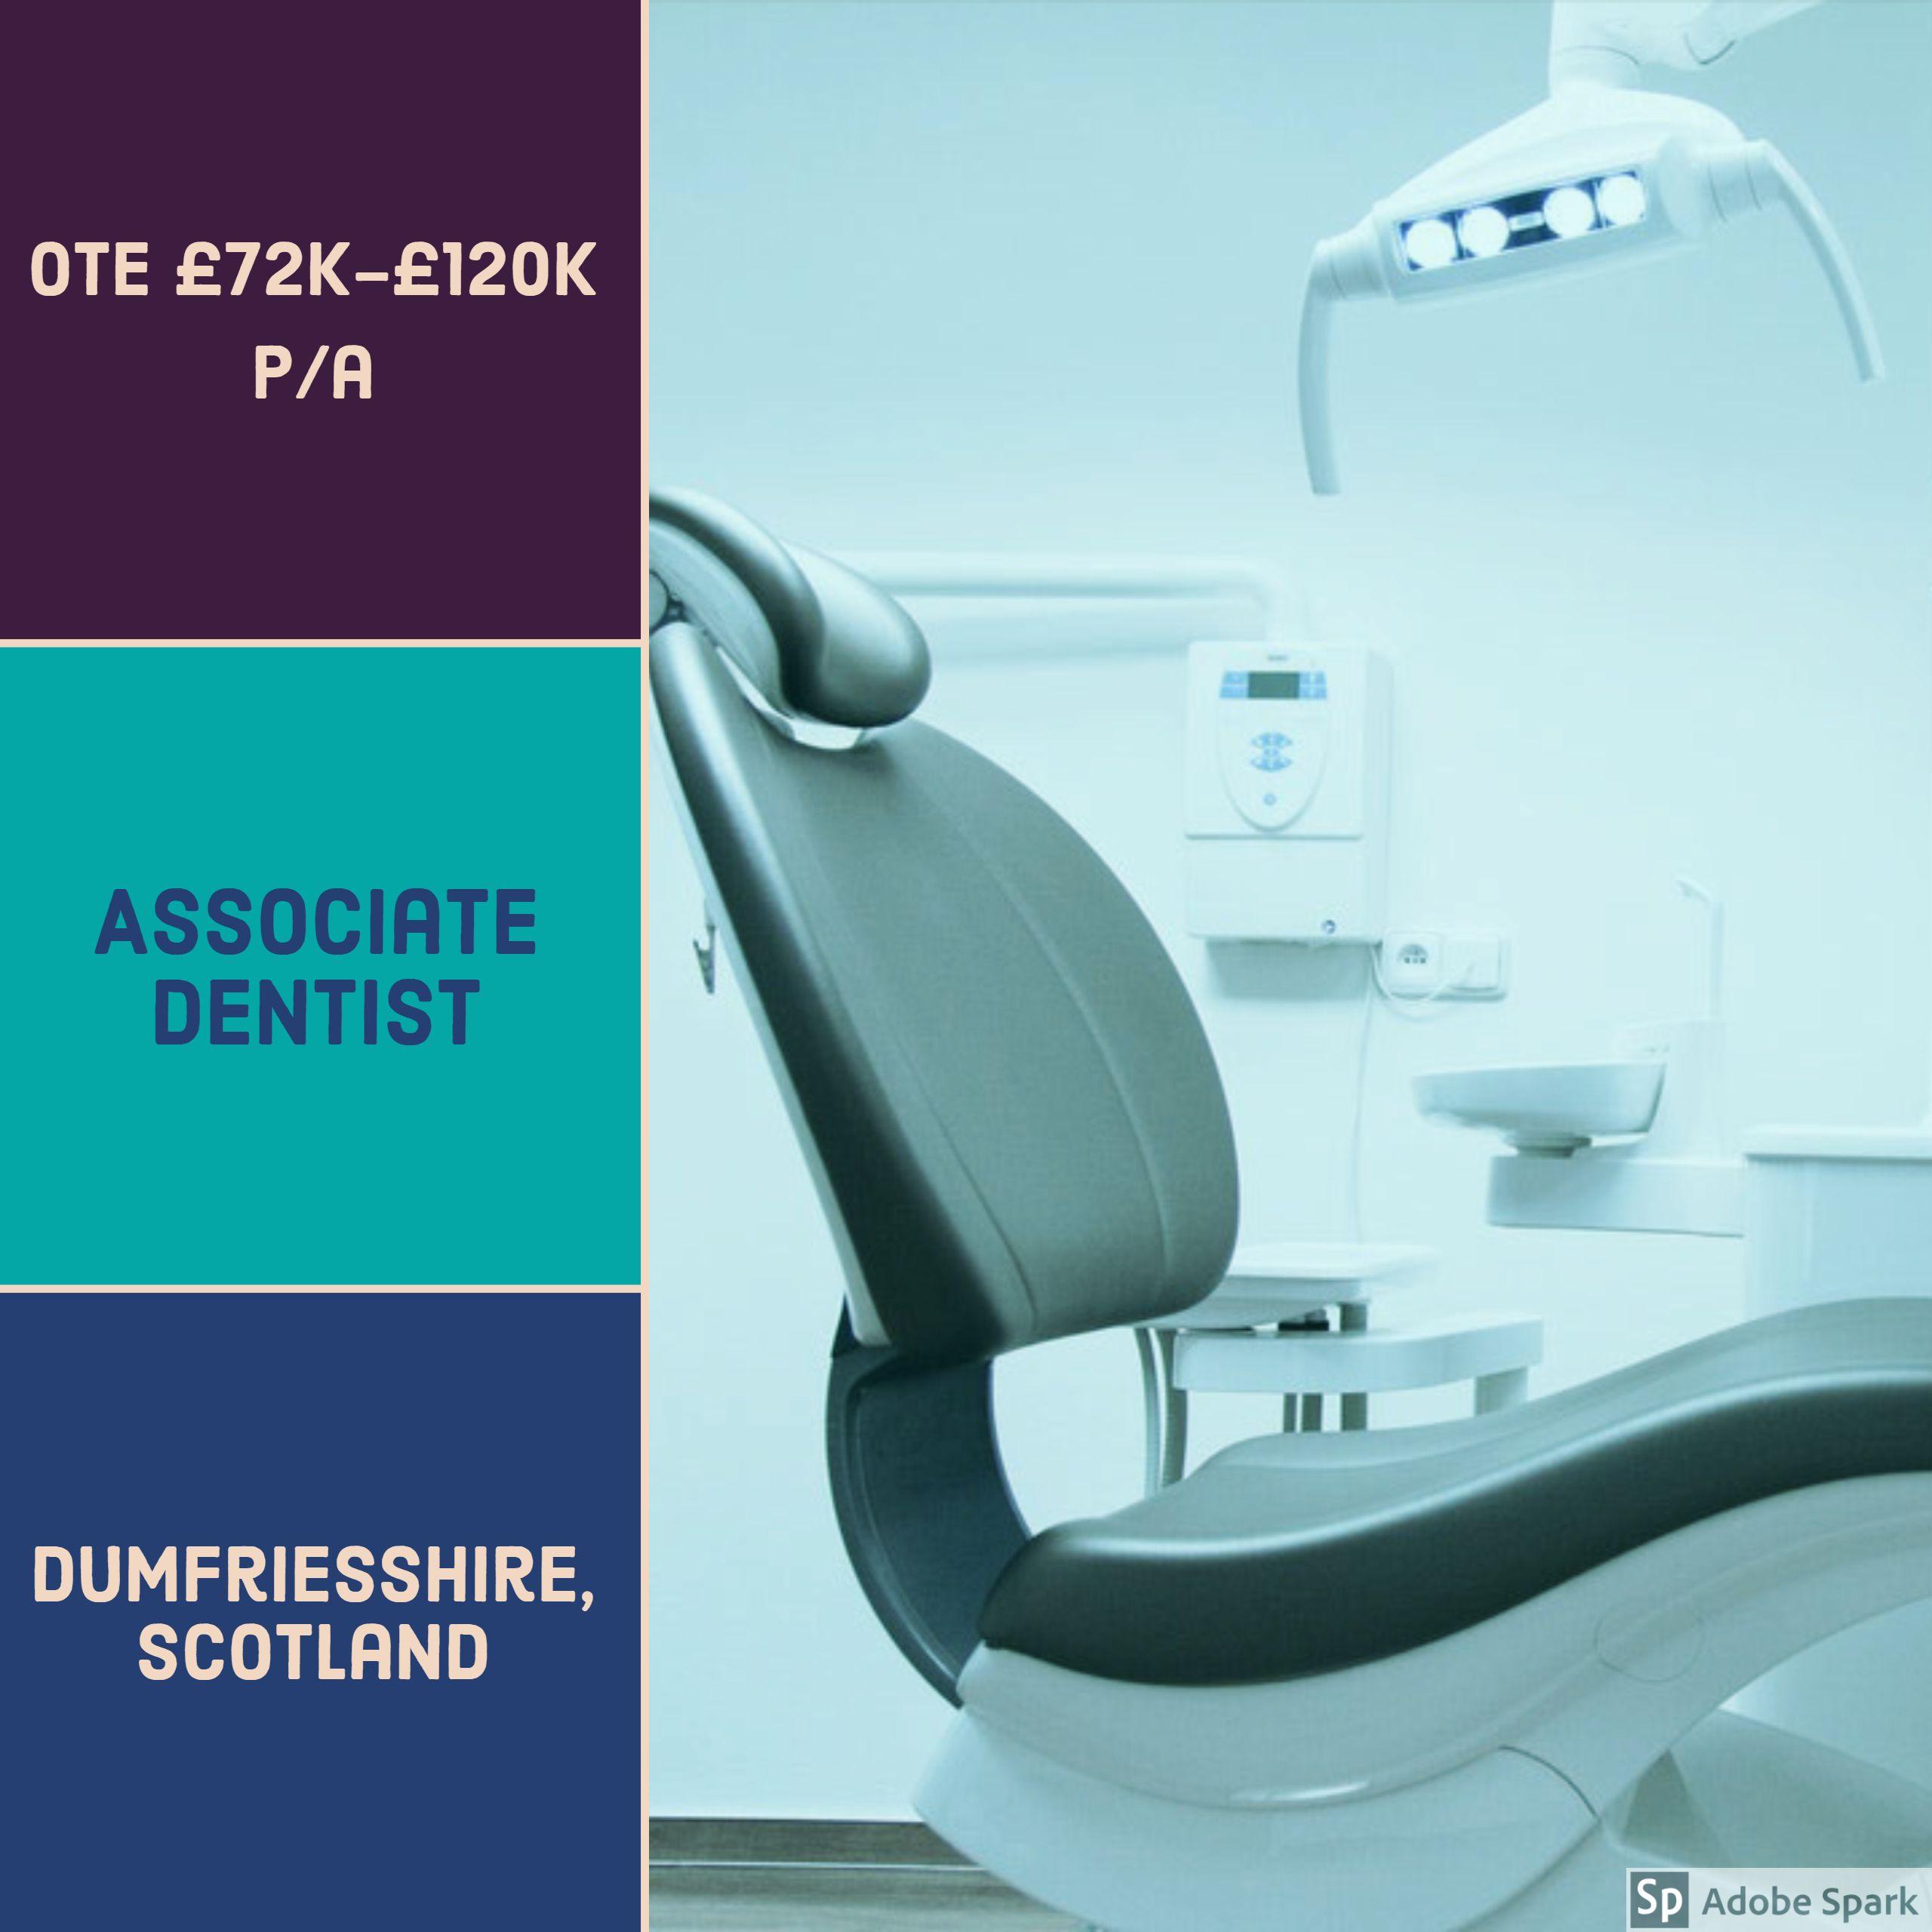 Associate dentist vacancy in scotland medical jobs